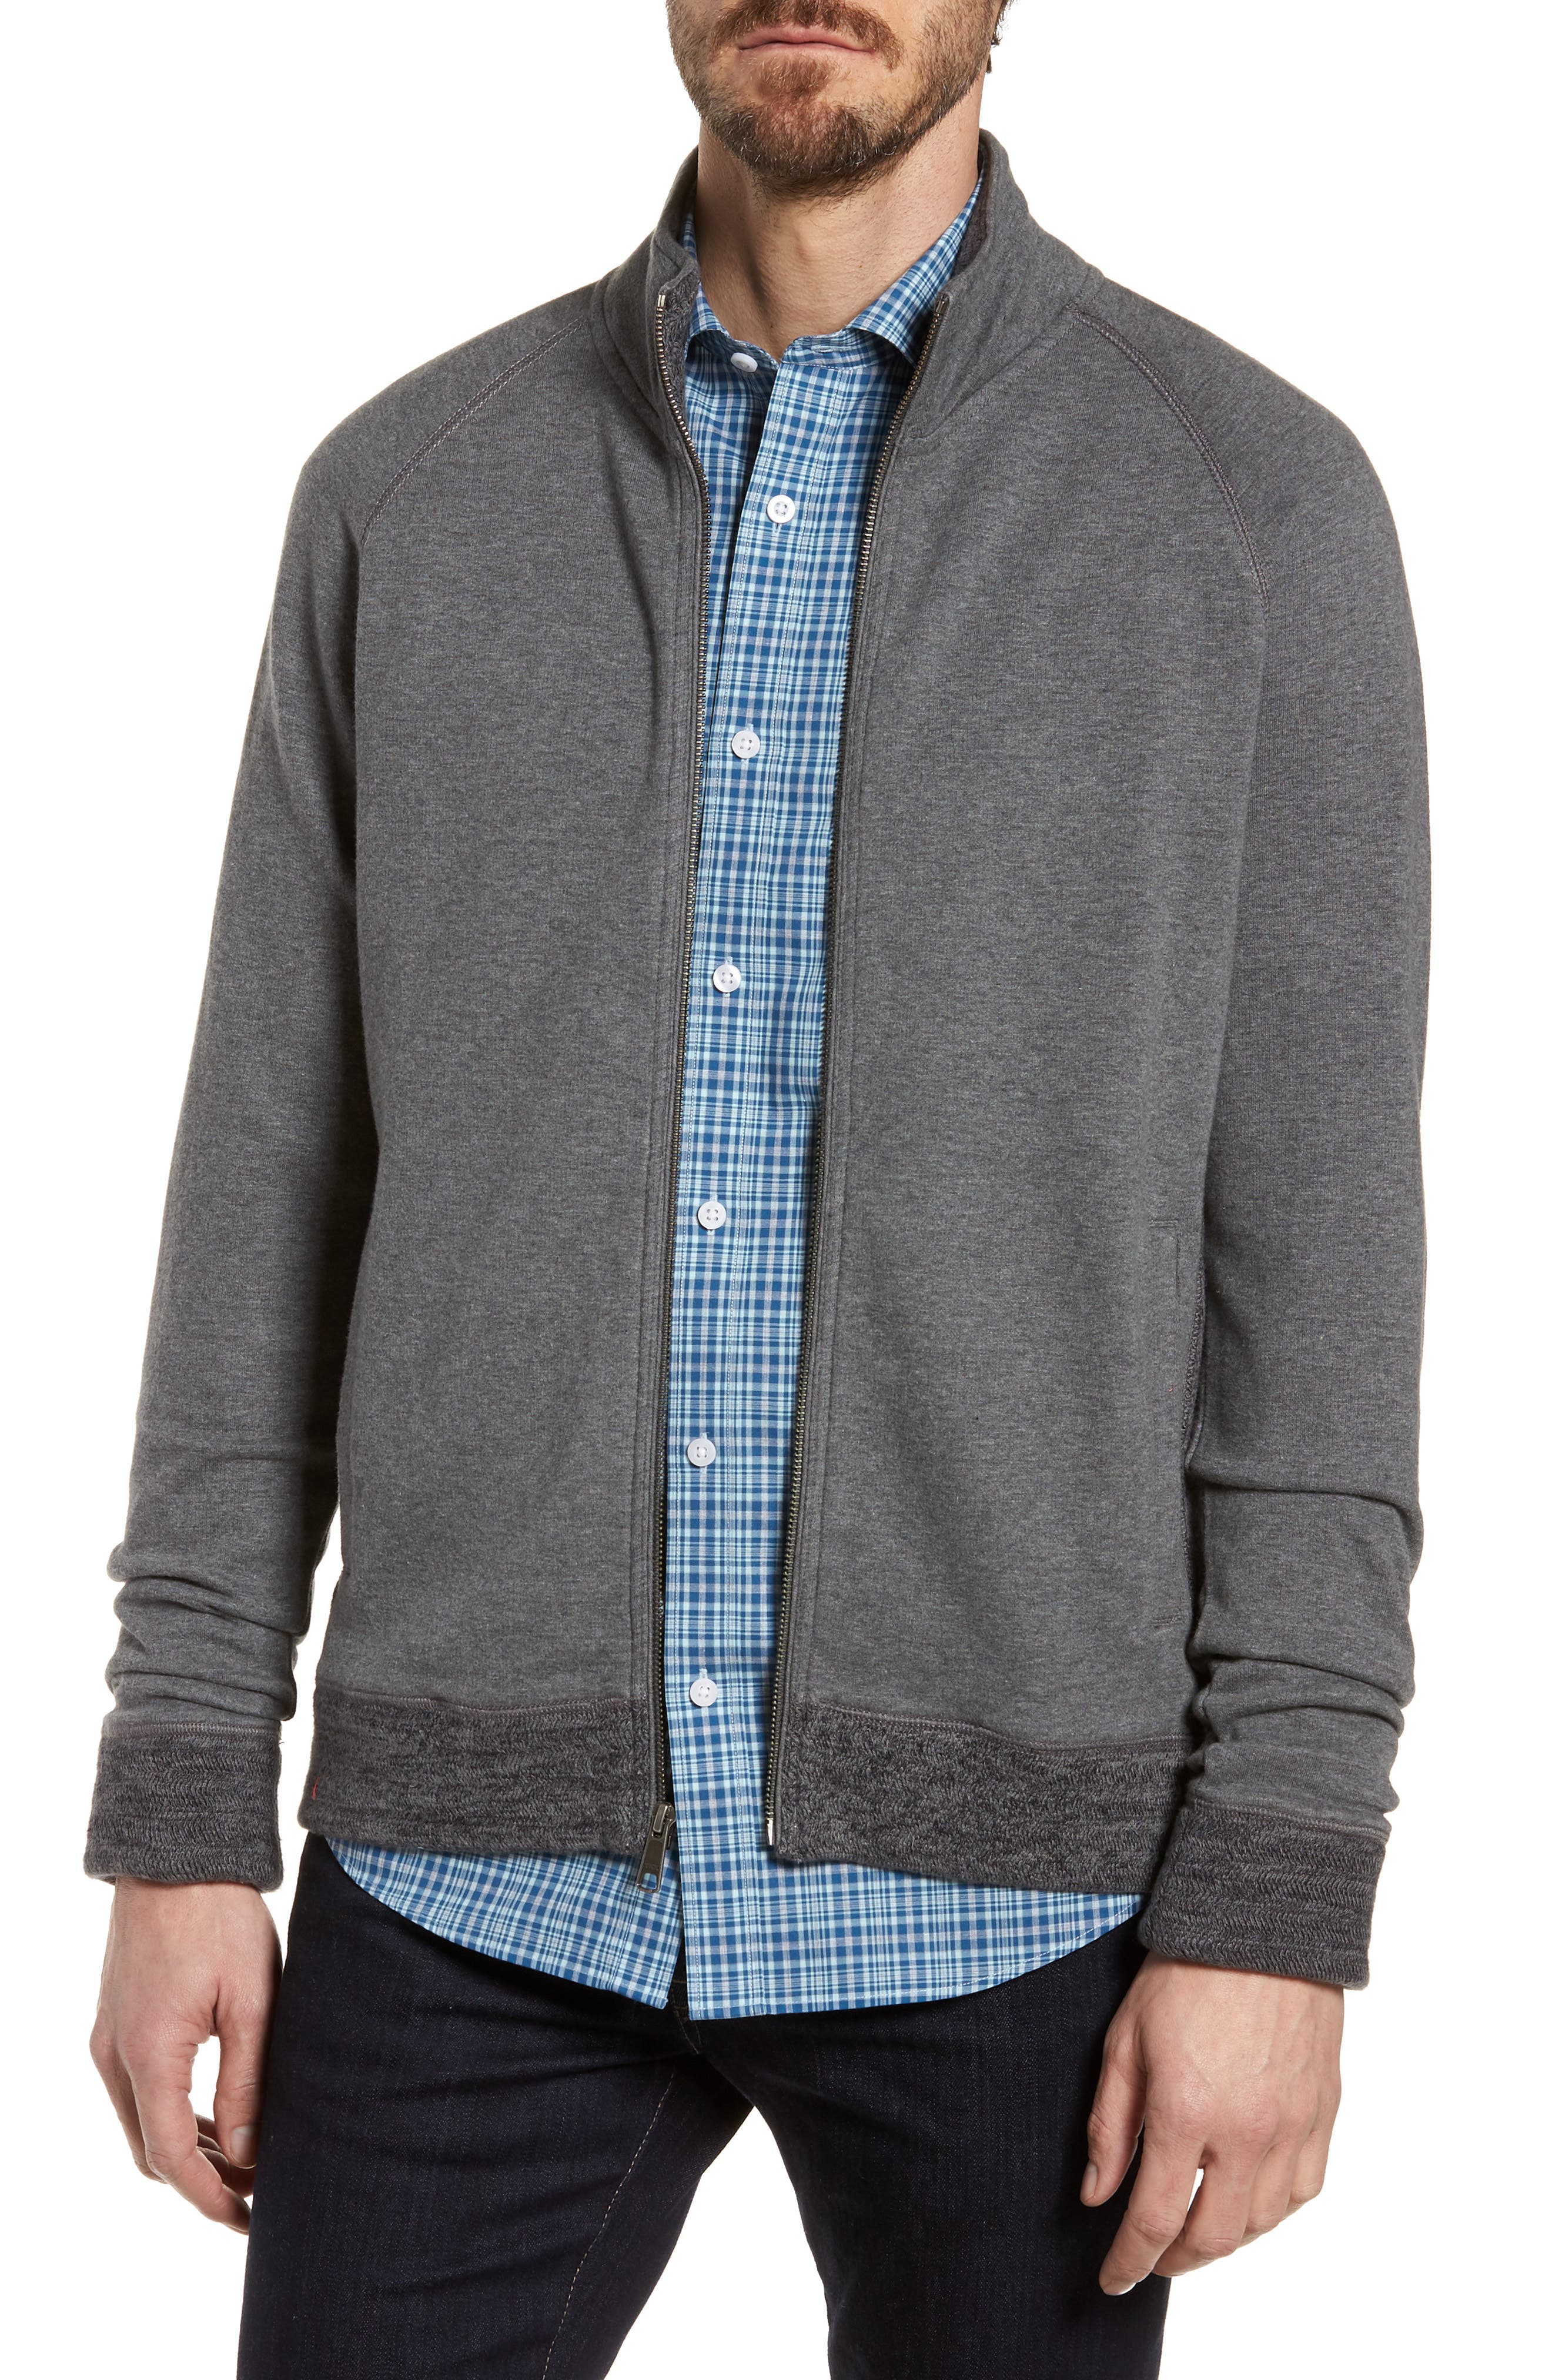 Full Zip Fleece Jacket,                             Main thumbnail 1, color,                             021